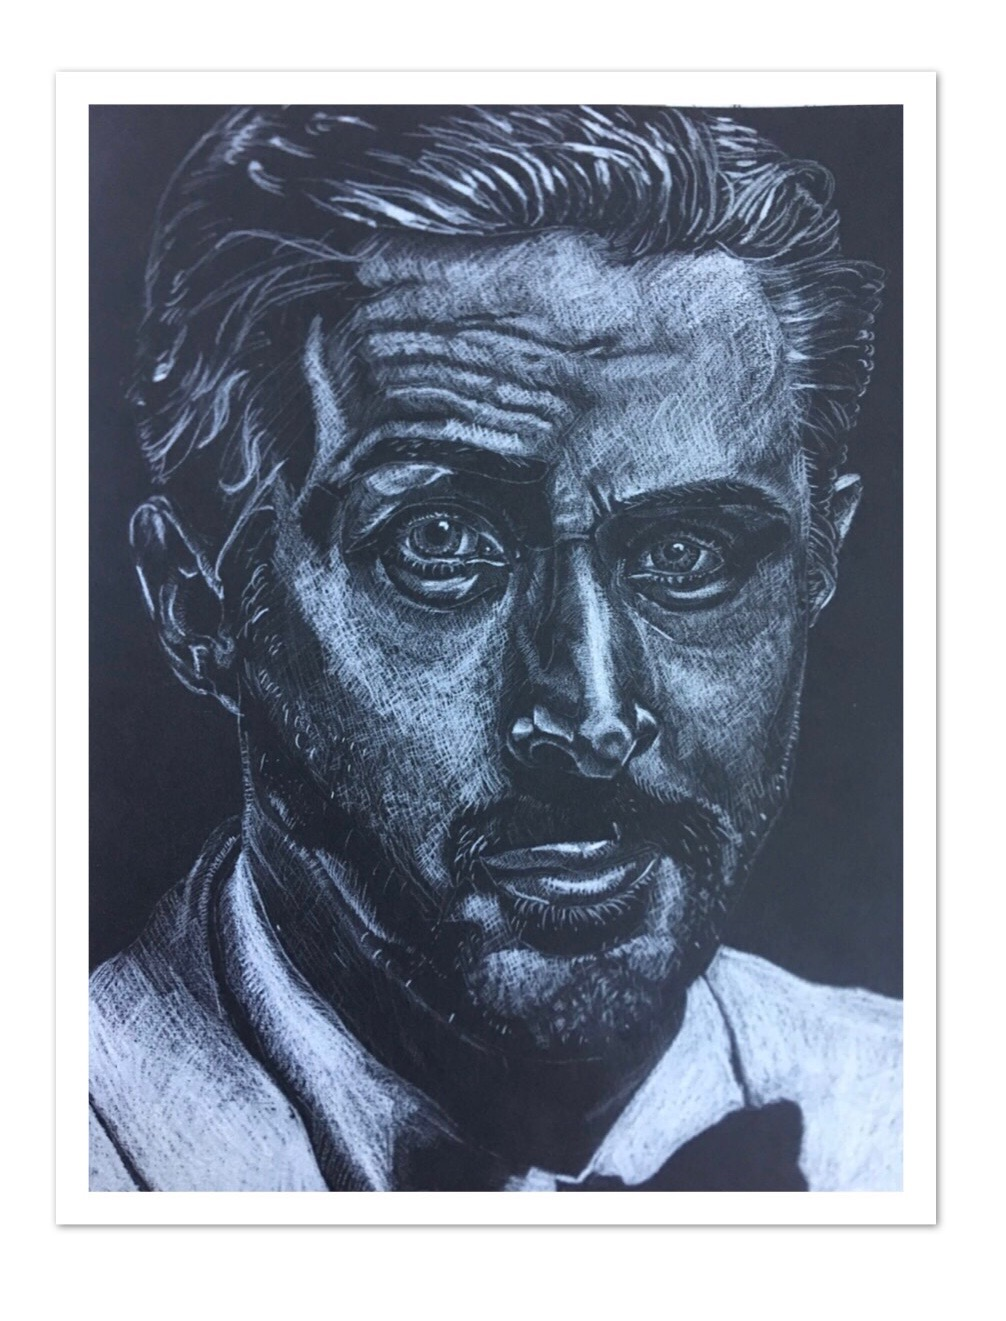 ART BY JOE! - He drew this portrait of Ryan Gosling!